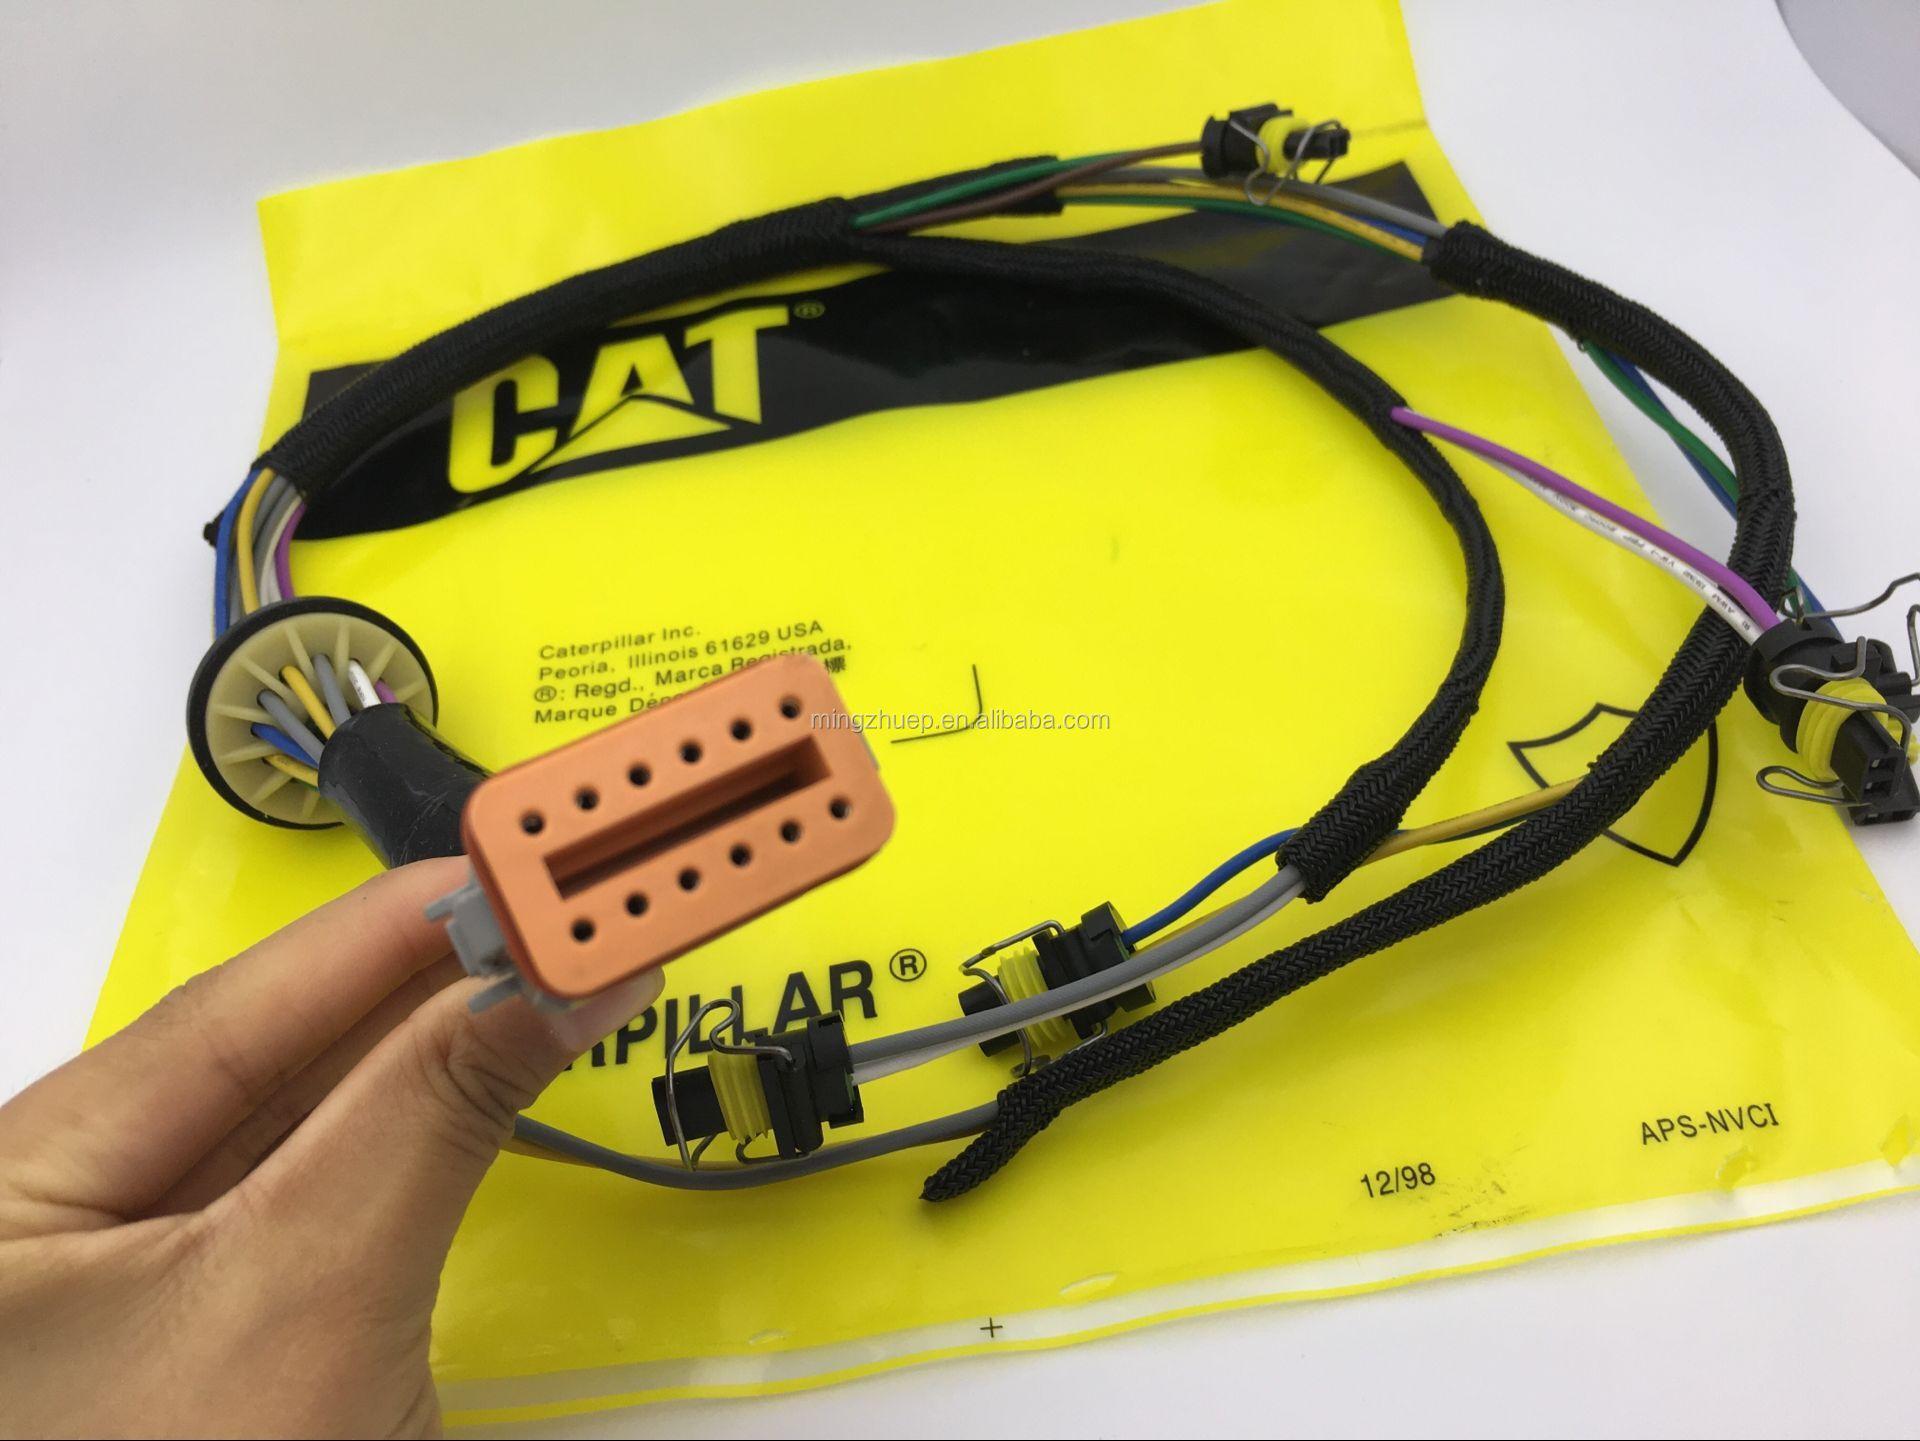 Excavator Parts C7 Diesel Engine Wire Harness 222 5917 195 7336 Packaging